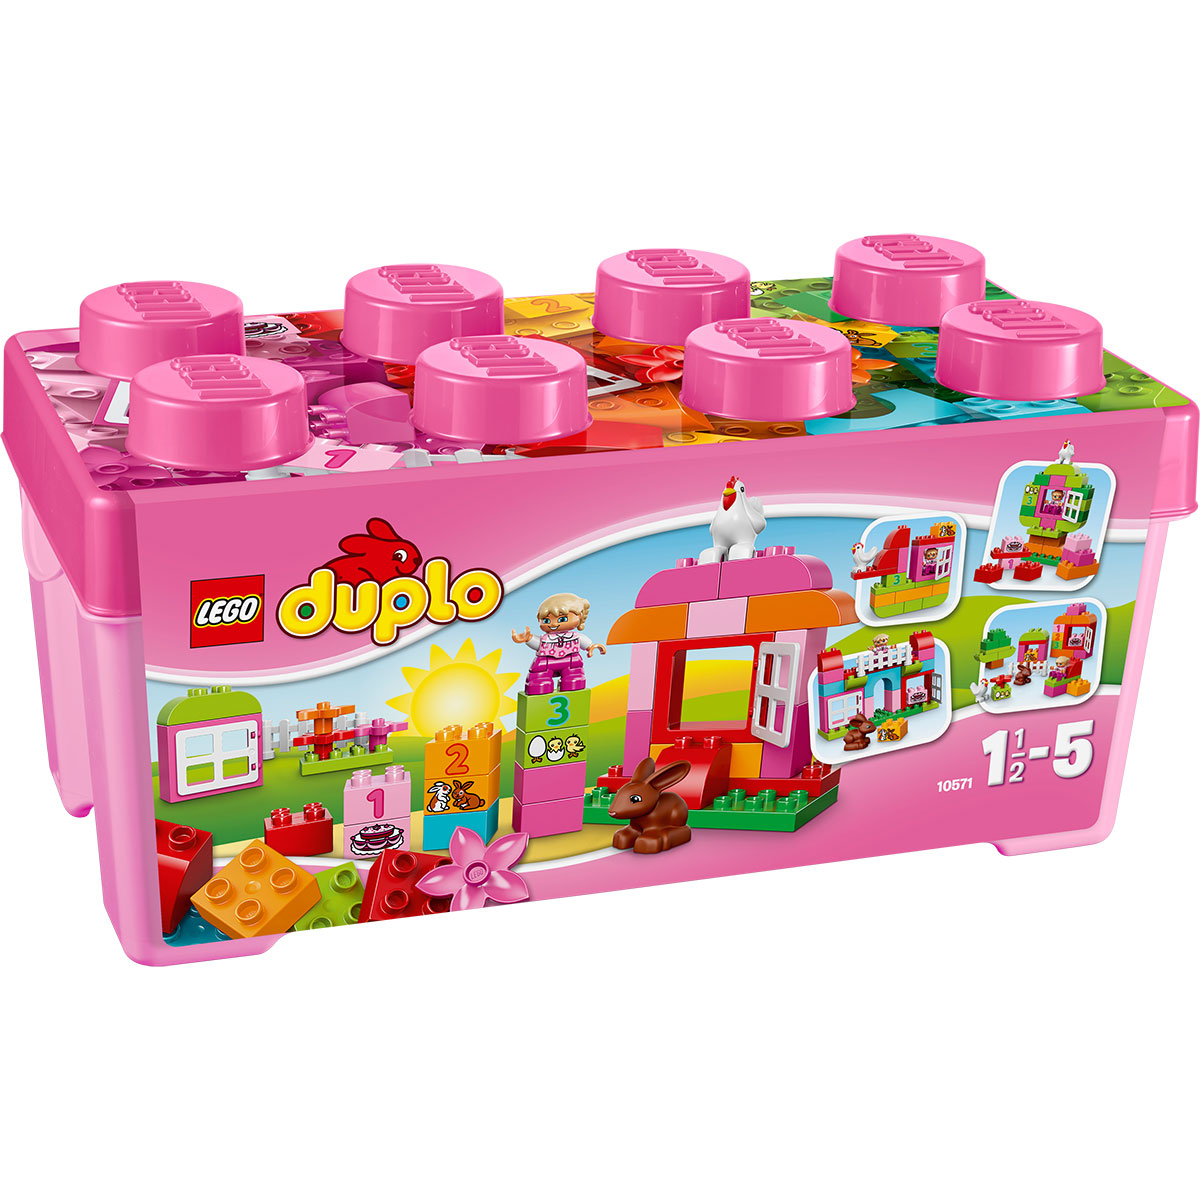 Do choi Lego Duplo 10571 - Trang trai mau hong